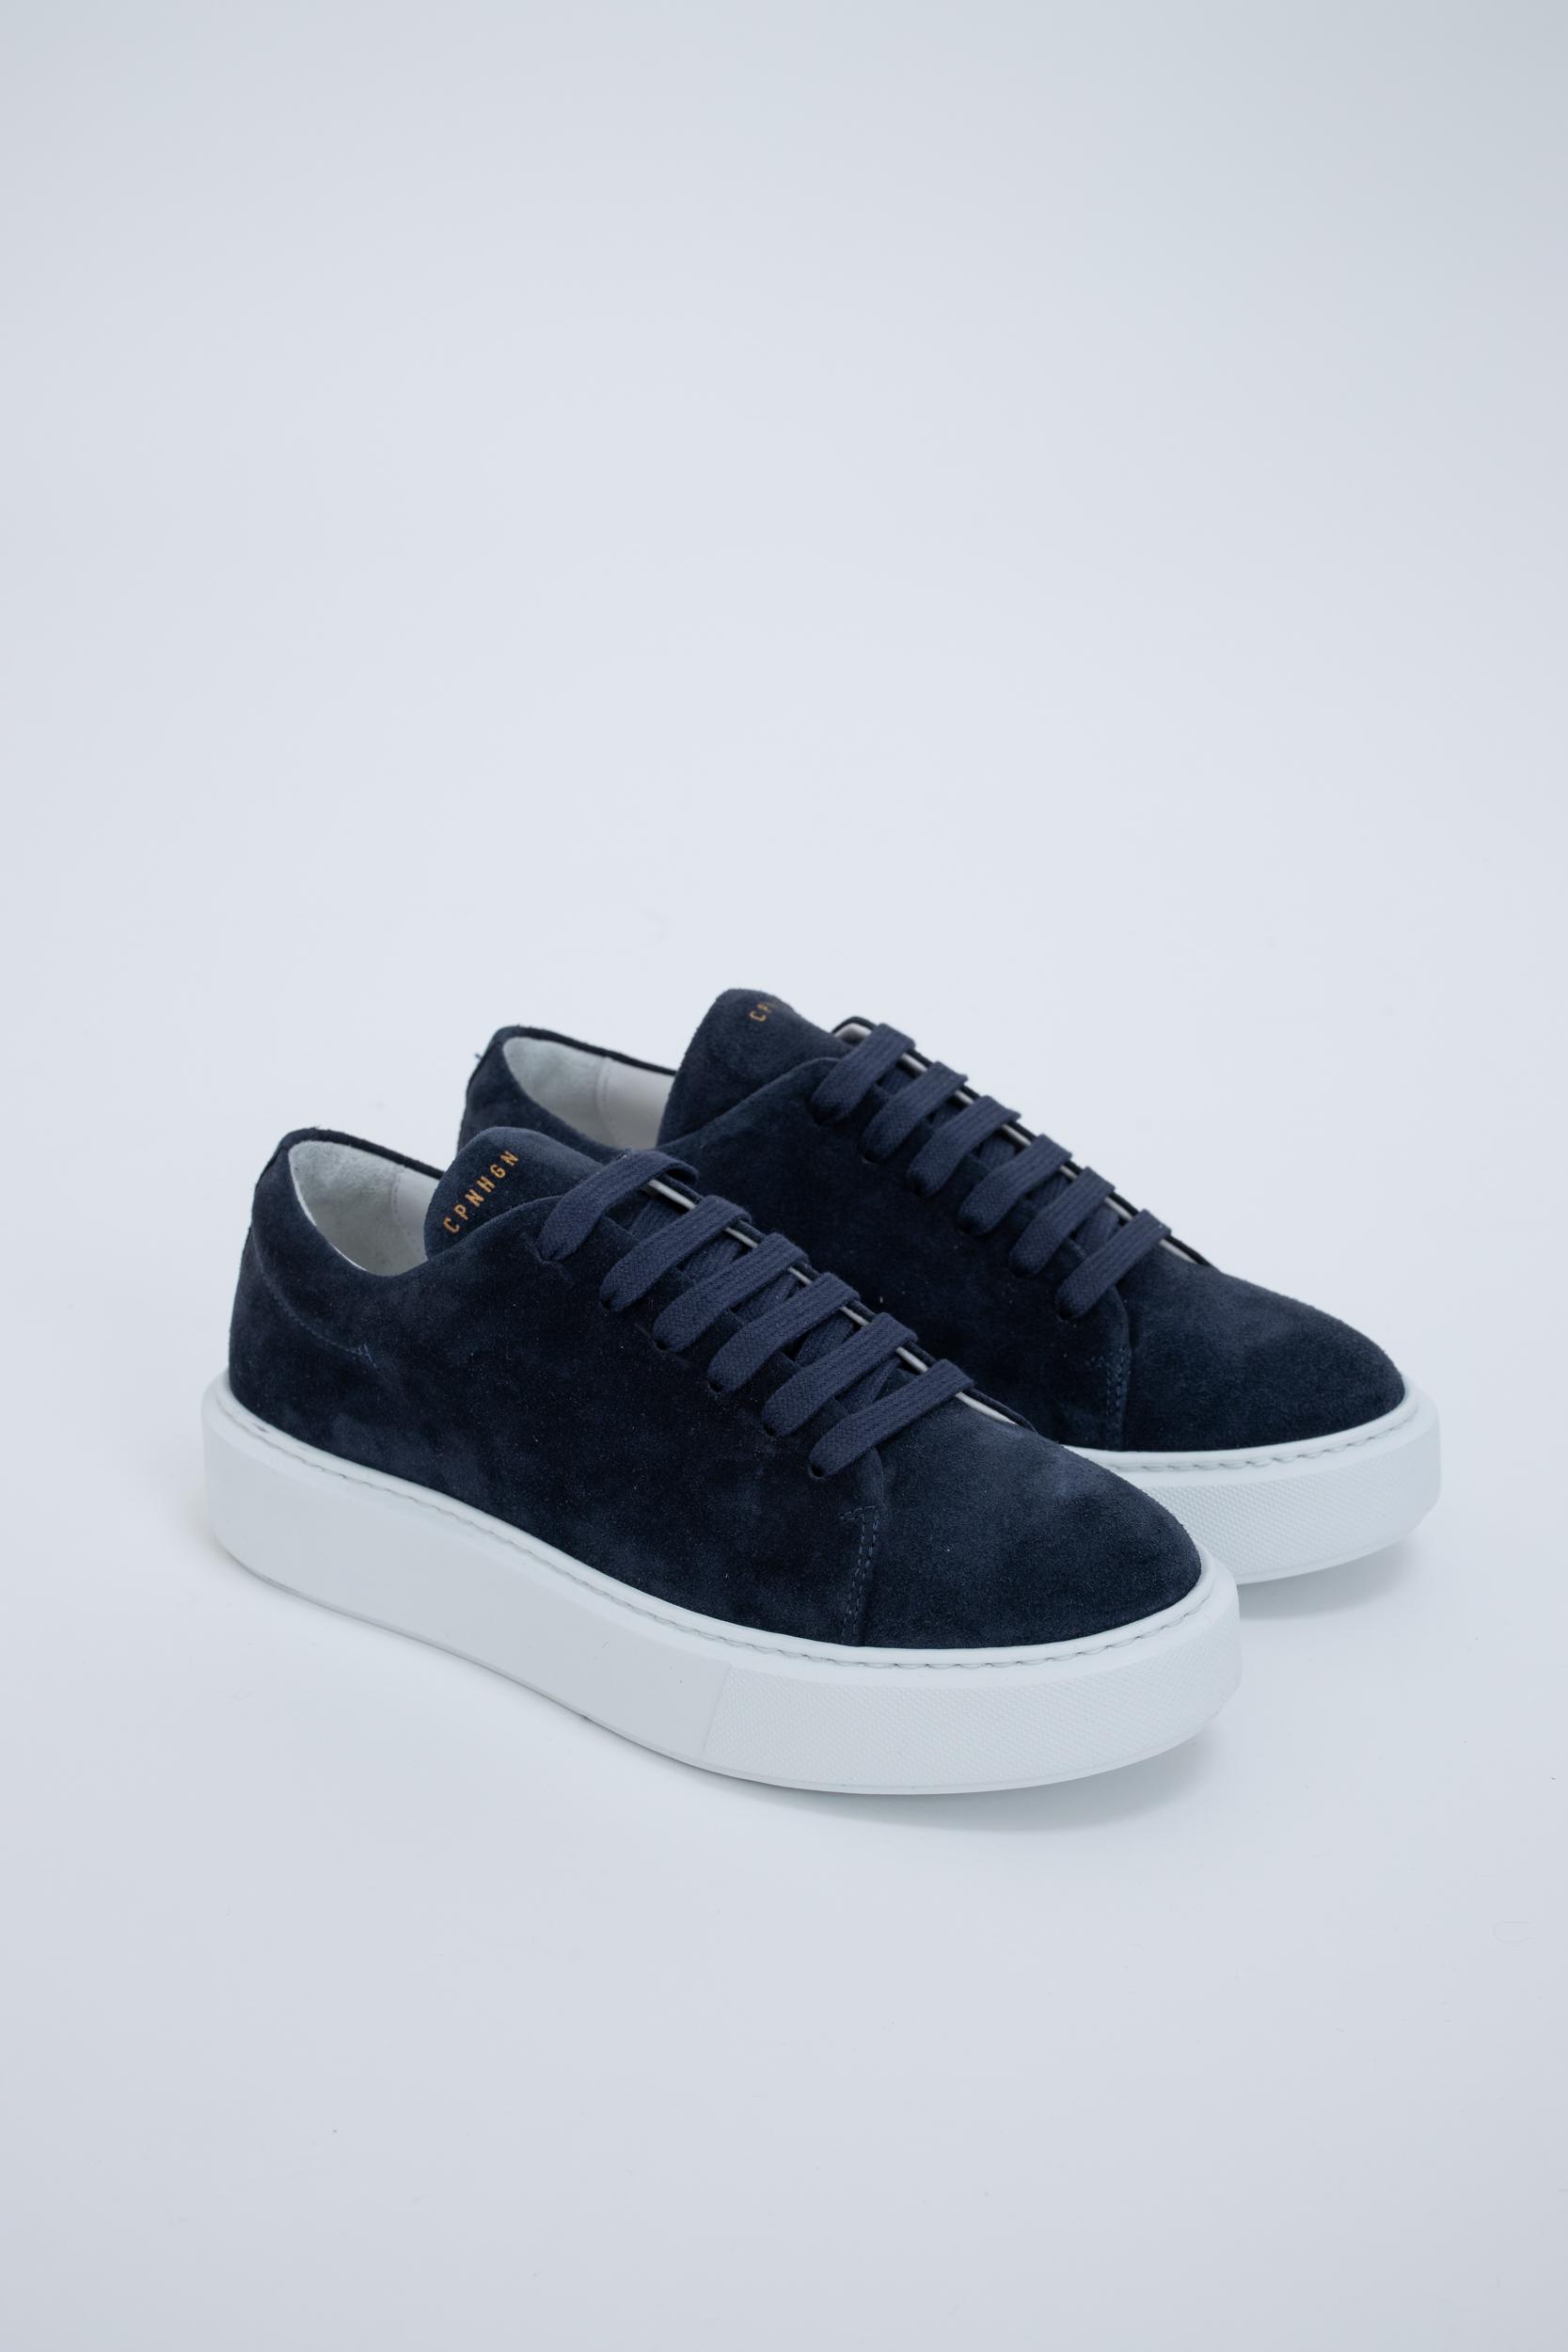 Schuhe CPH407 Crosta Navy